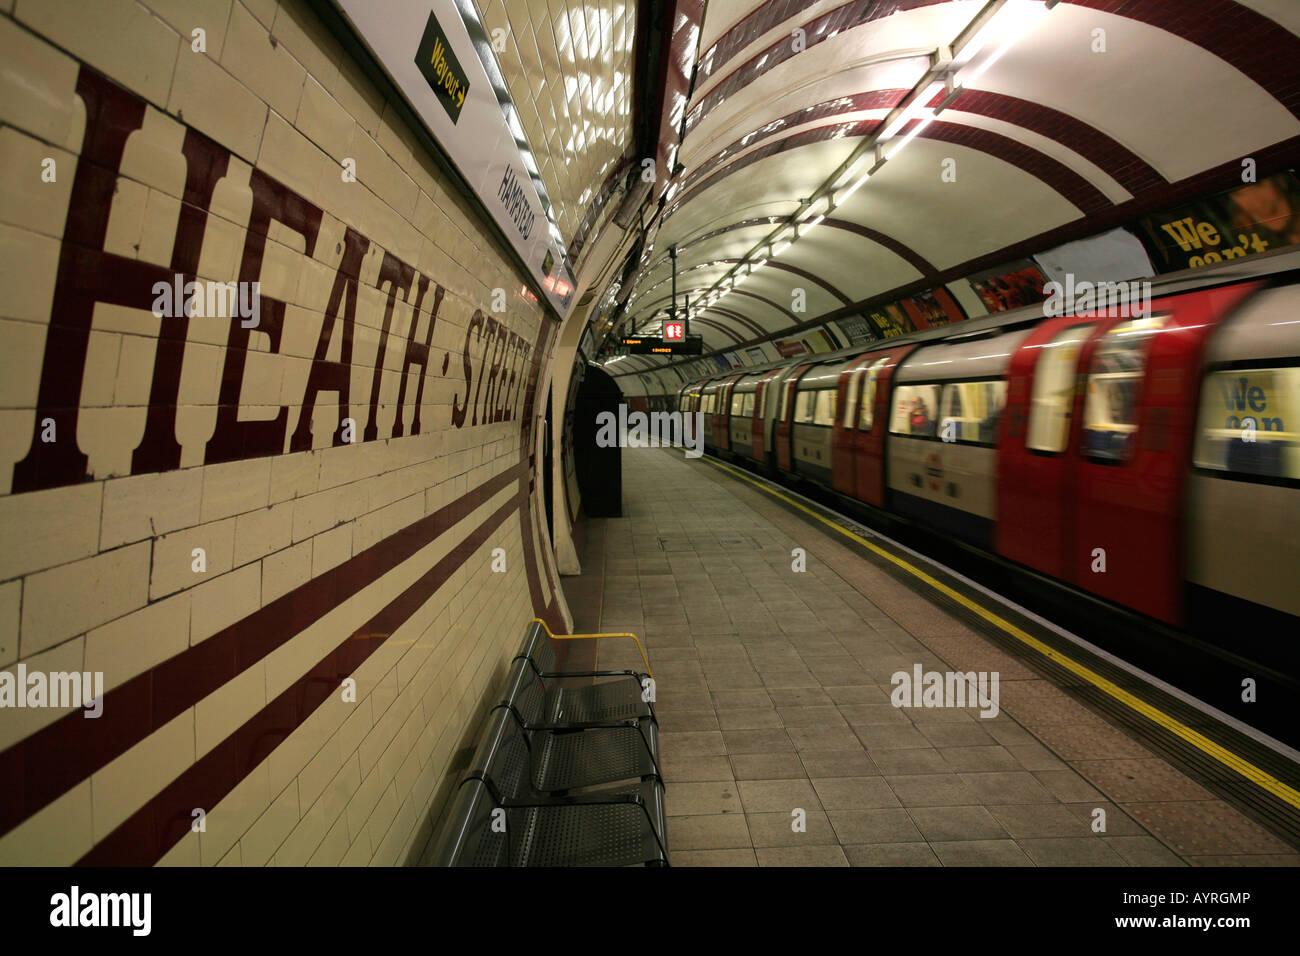 Hampstead tube station, London Underground, London ... London Underground Stations